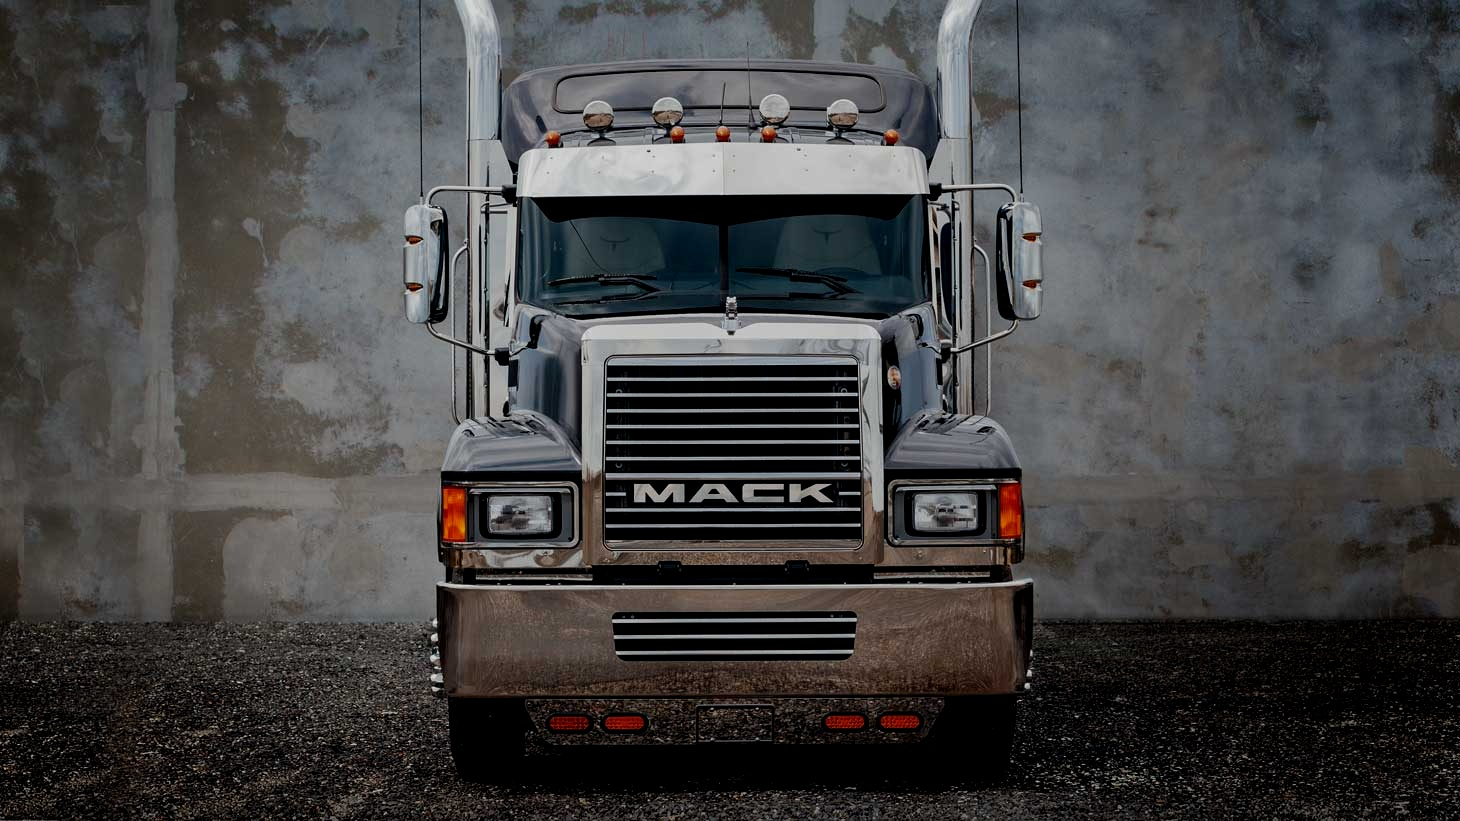 Mack Trucks - digital ecosytem + asset maanger